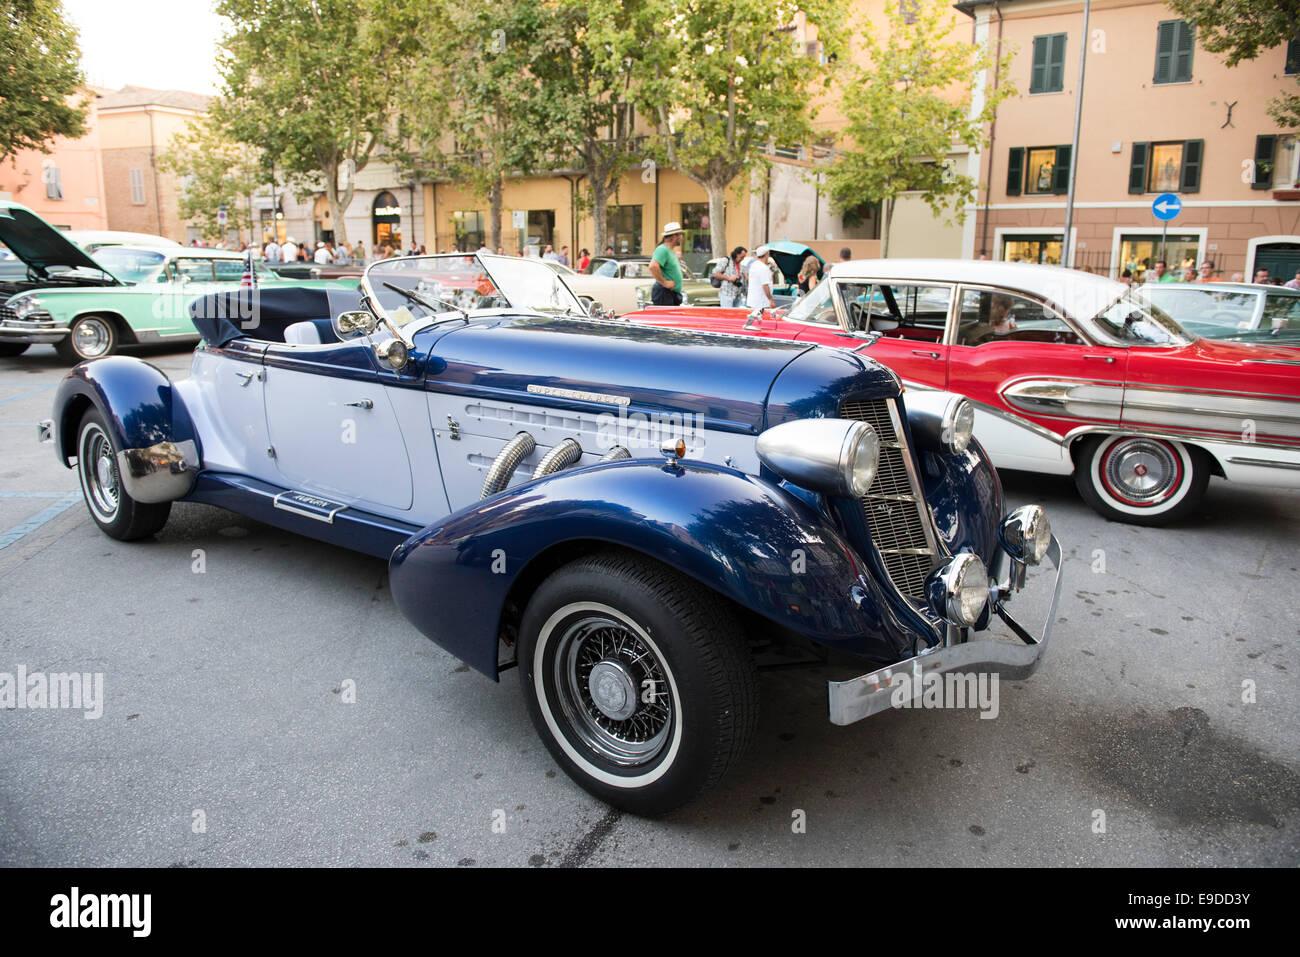 Auburn, Oldtimer, Old, Classic Car, Vintage Car, Summer Jamboree ...